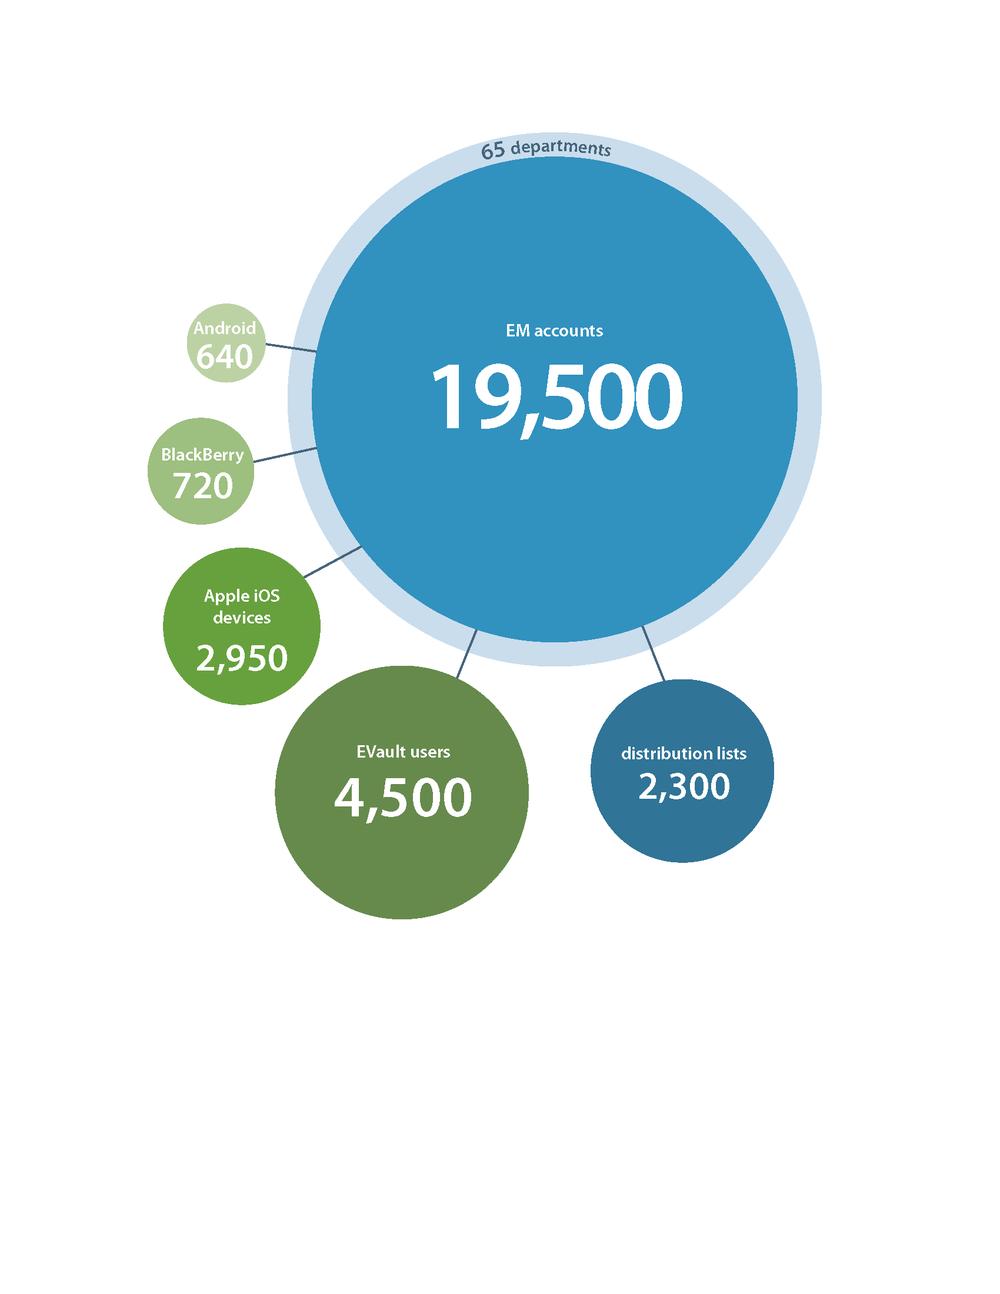 em stats infographic_2012.png